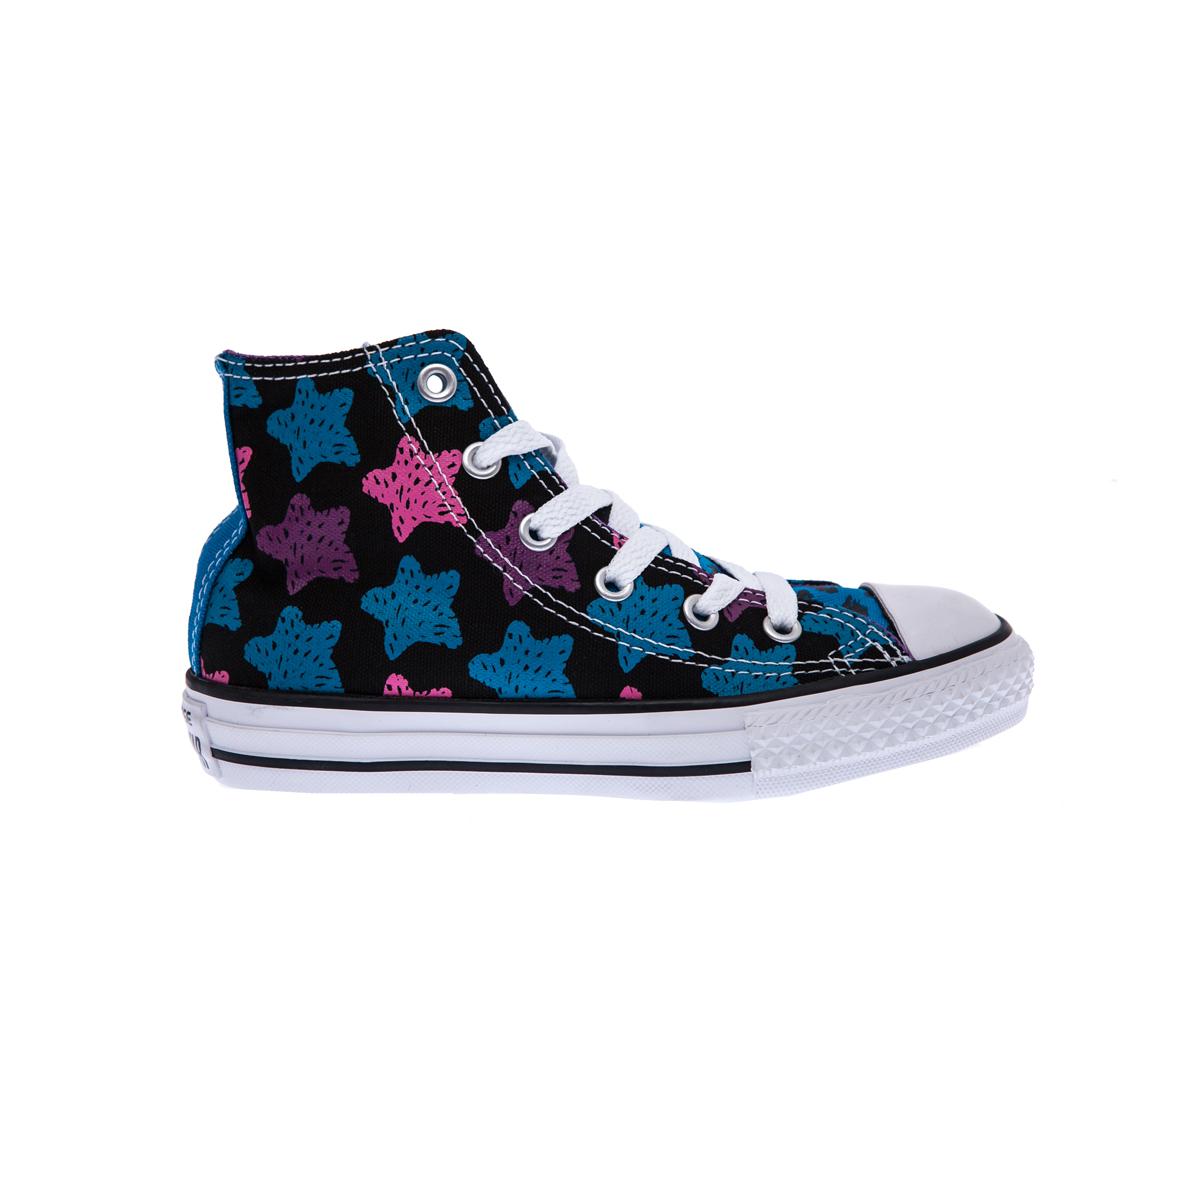 42a139409df Factoryoutlet CONVERSE – Παιδικά παπούτσια Chuck Taylor All Star Hi μαύρα